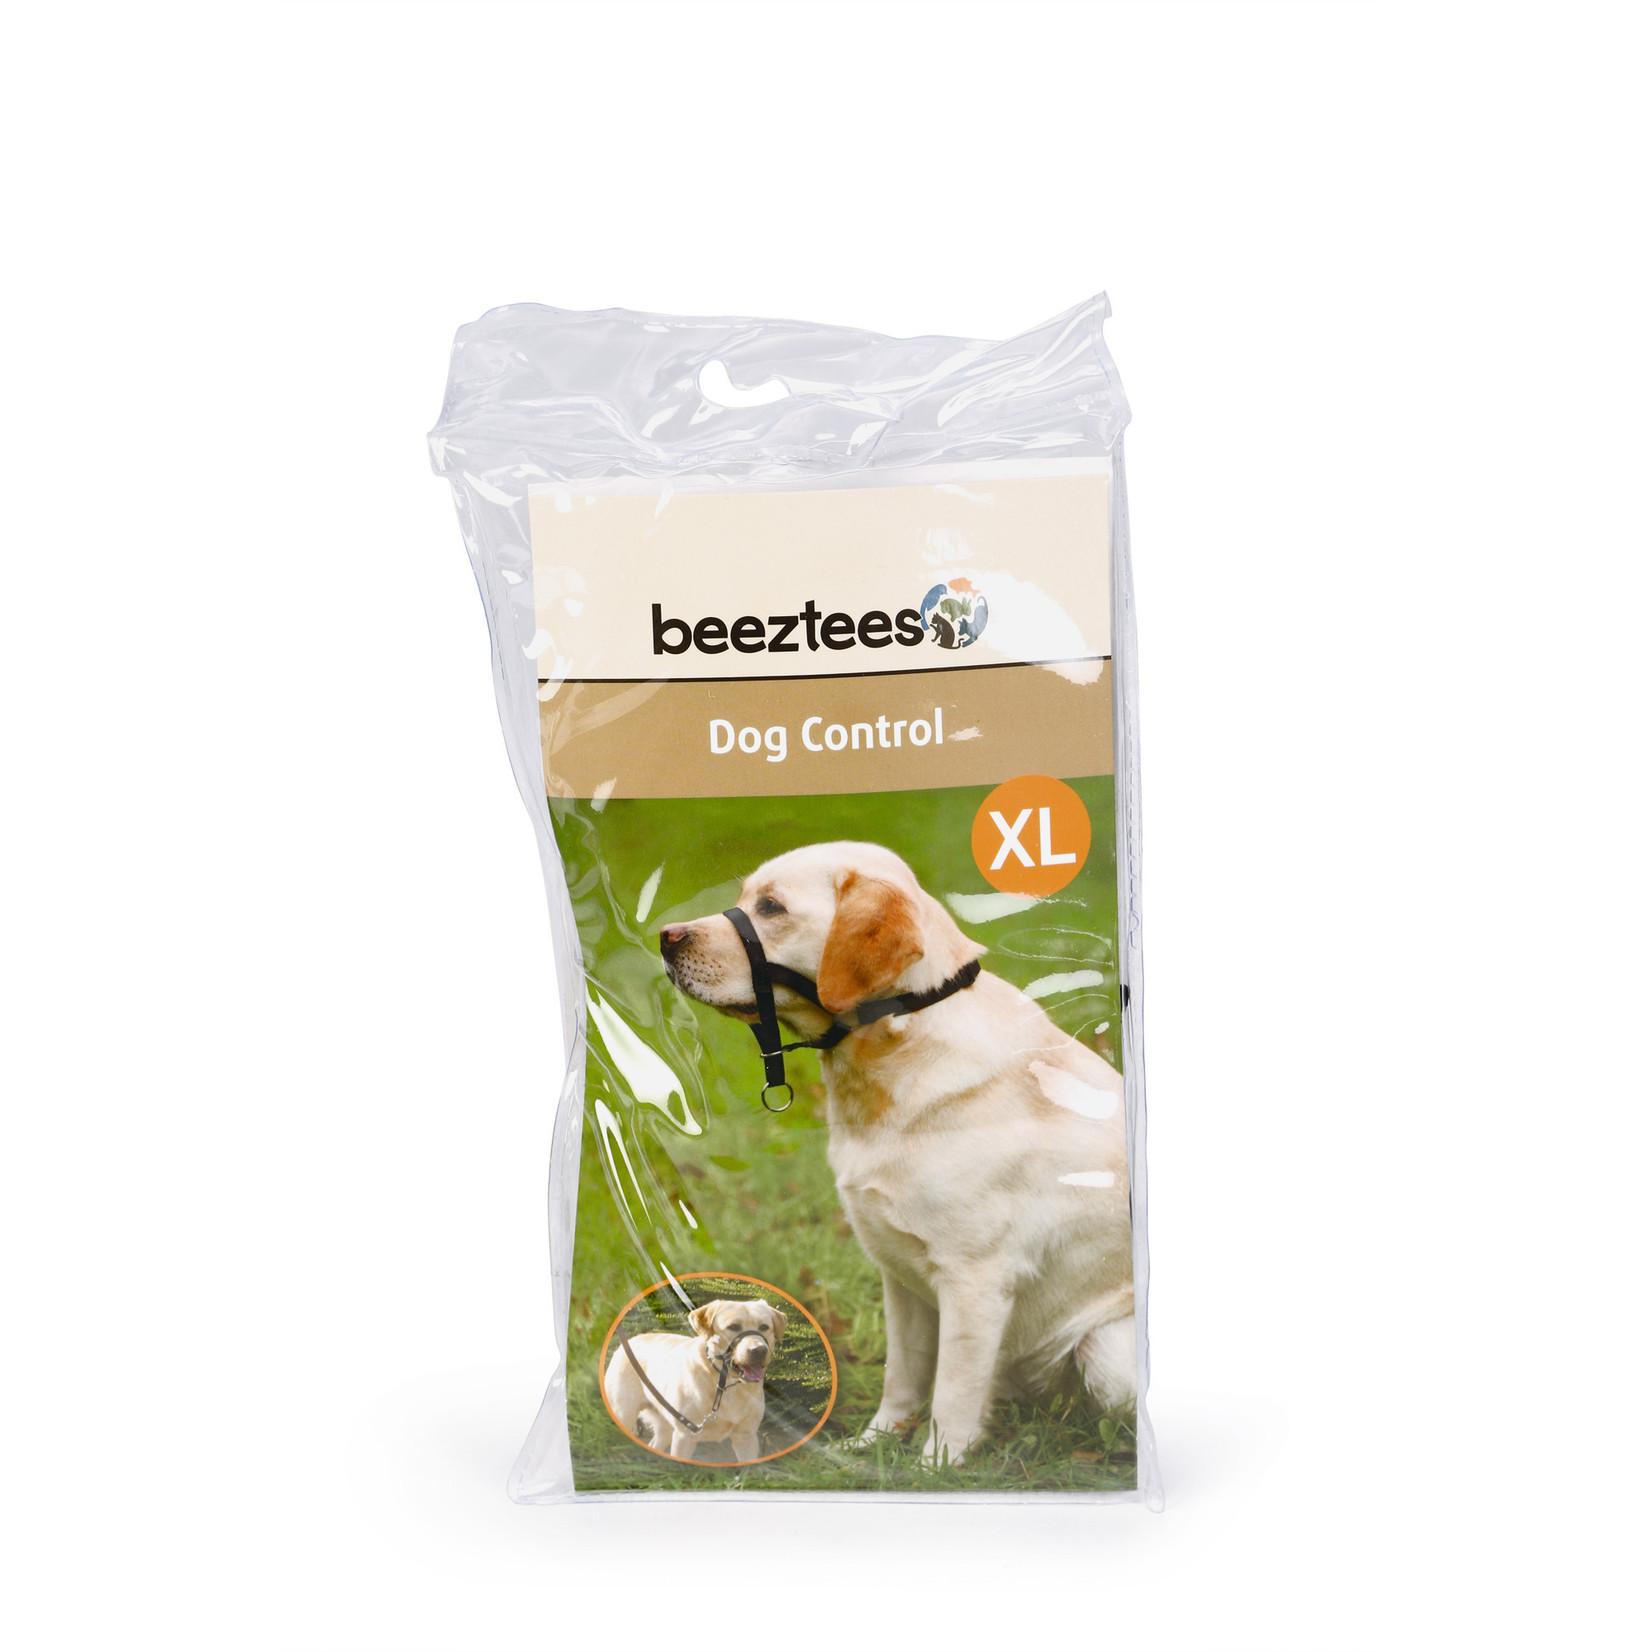 Beeztees Dog Control